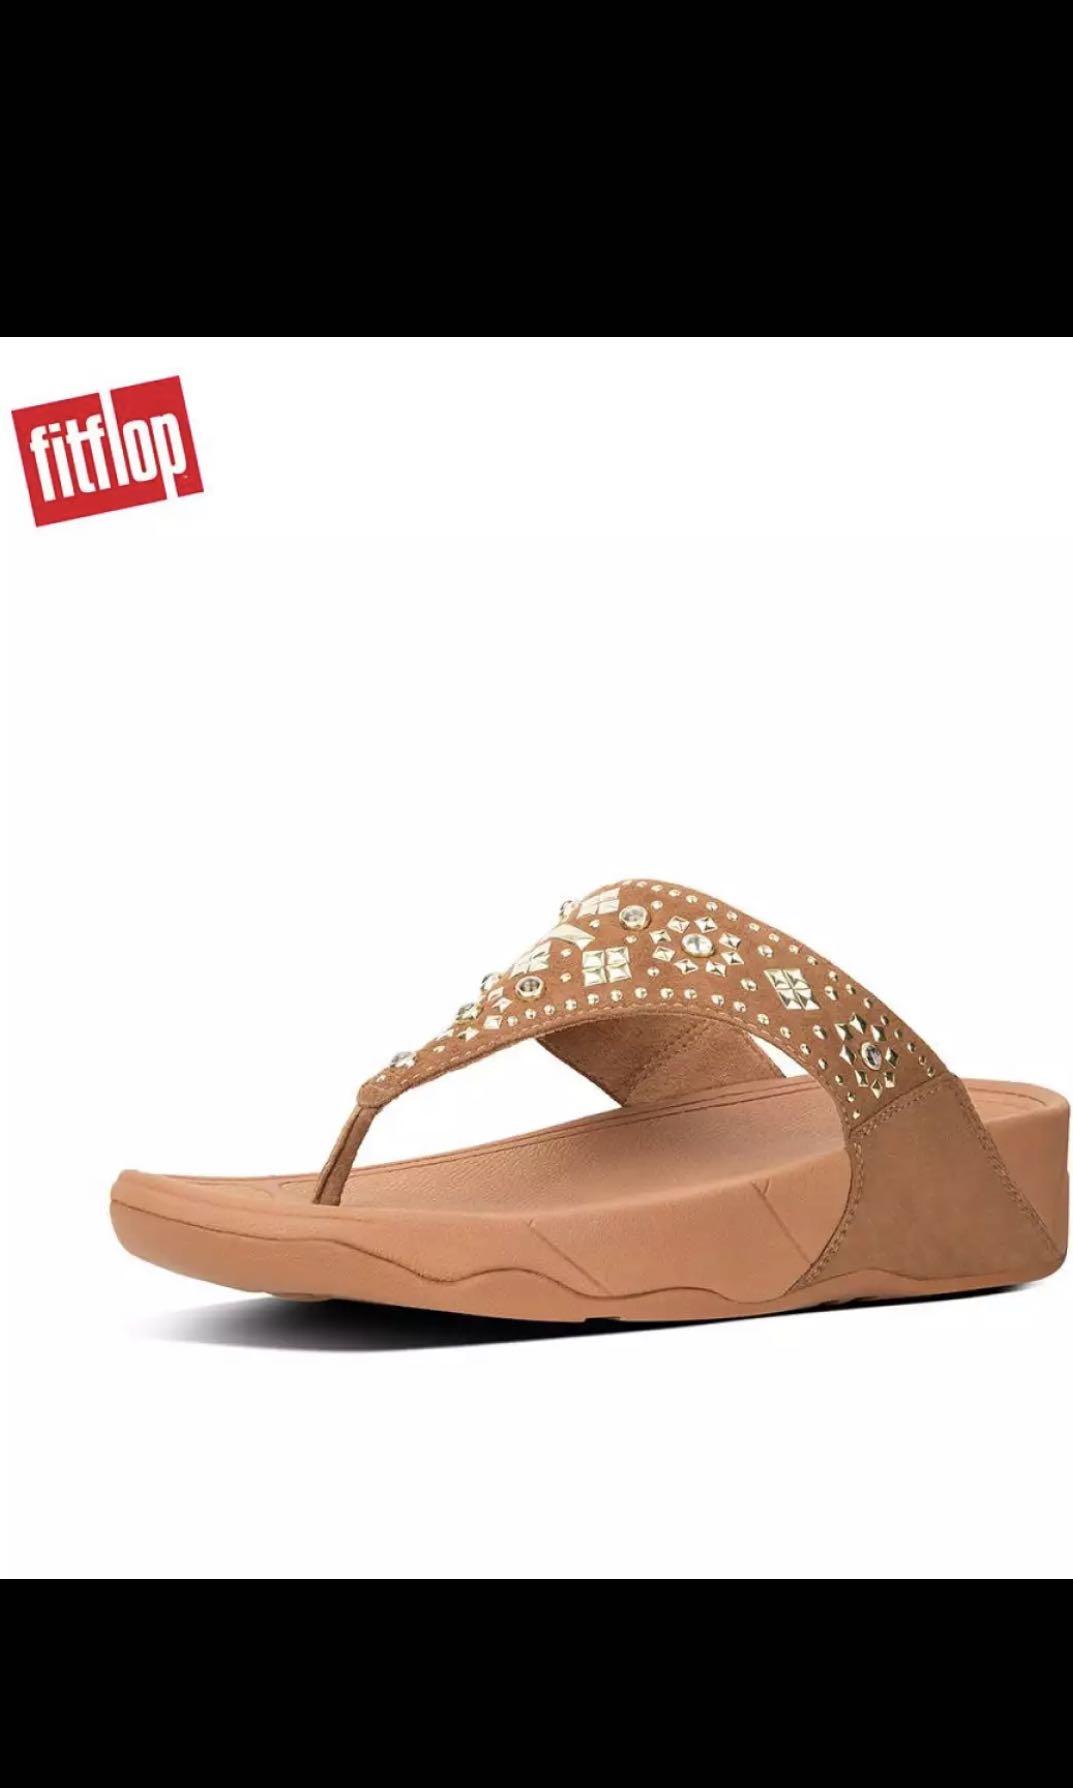 b050192aa8d6 Fitflop Women s Sandals K50 LULU AZTEK STUD TOE THONG SANDALS ...